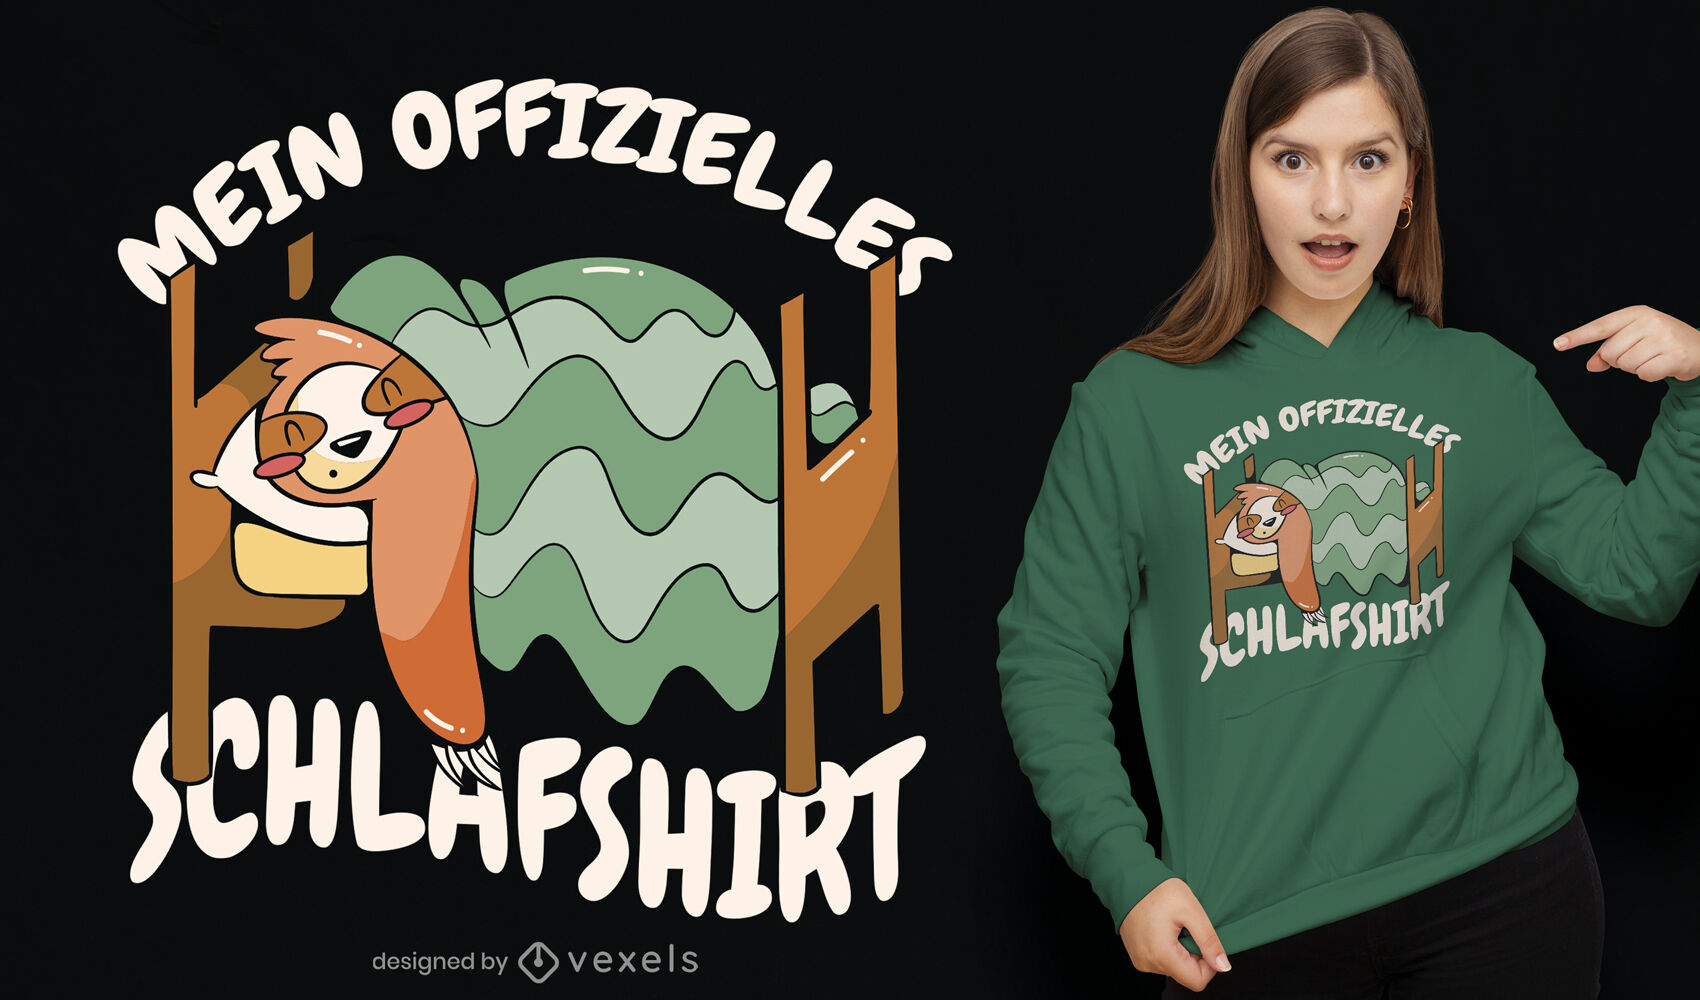 Sleeping sloth german t-shirt design